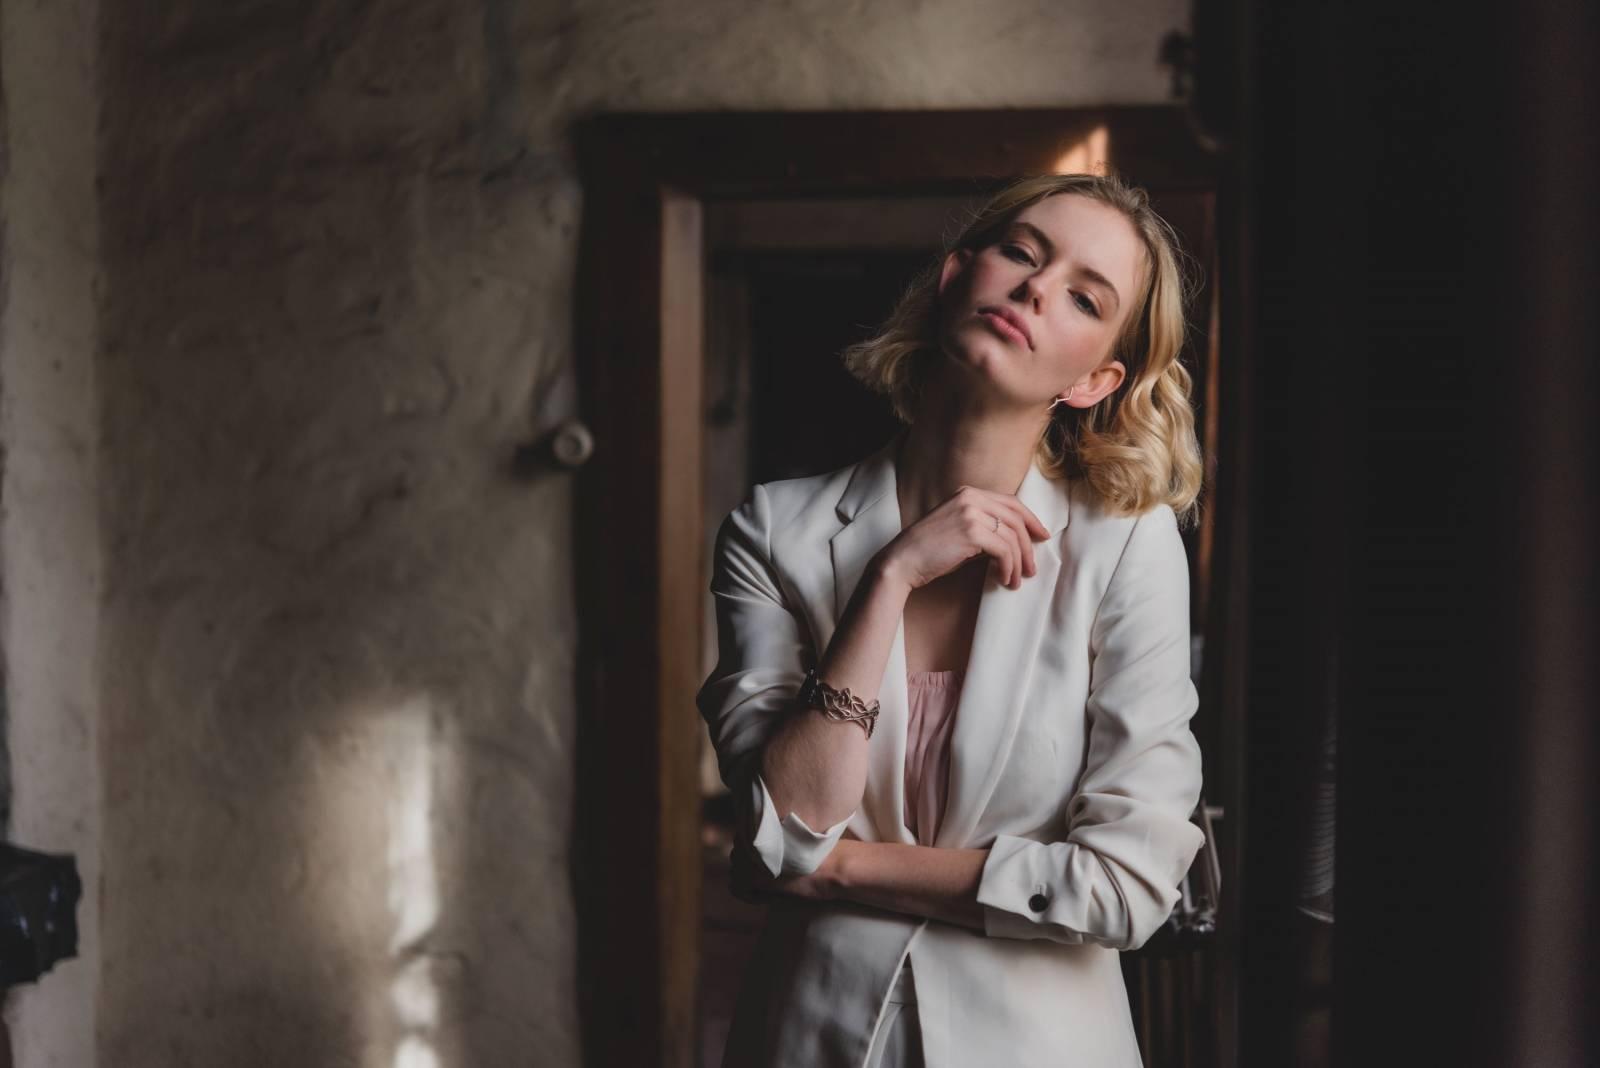 Nathalie Swinnen - Juwelen - Bruidsjuwelen - Verlovingsring - Trouwring - House of Weddings - 9